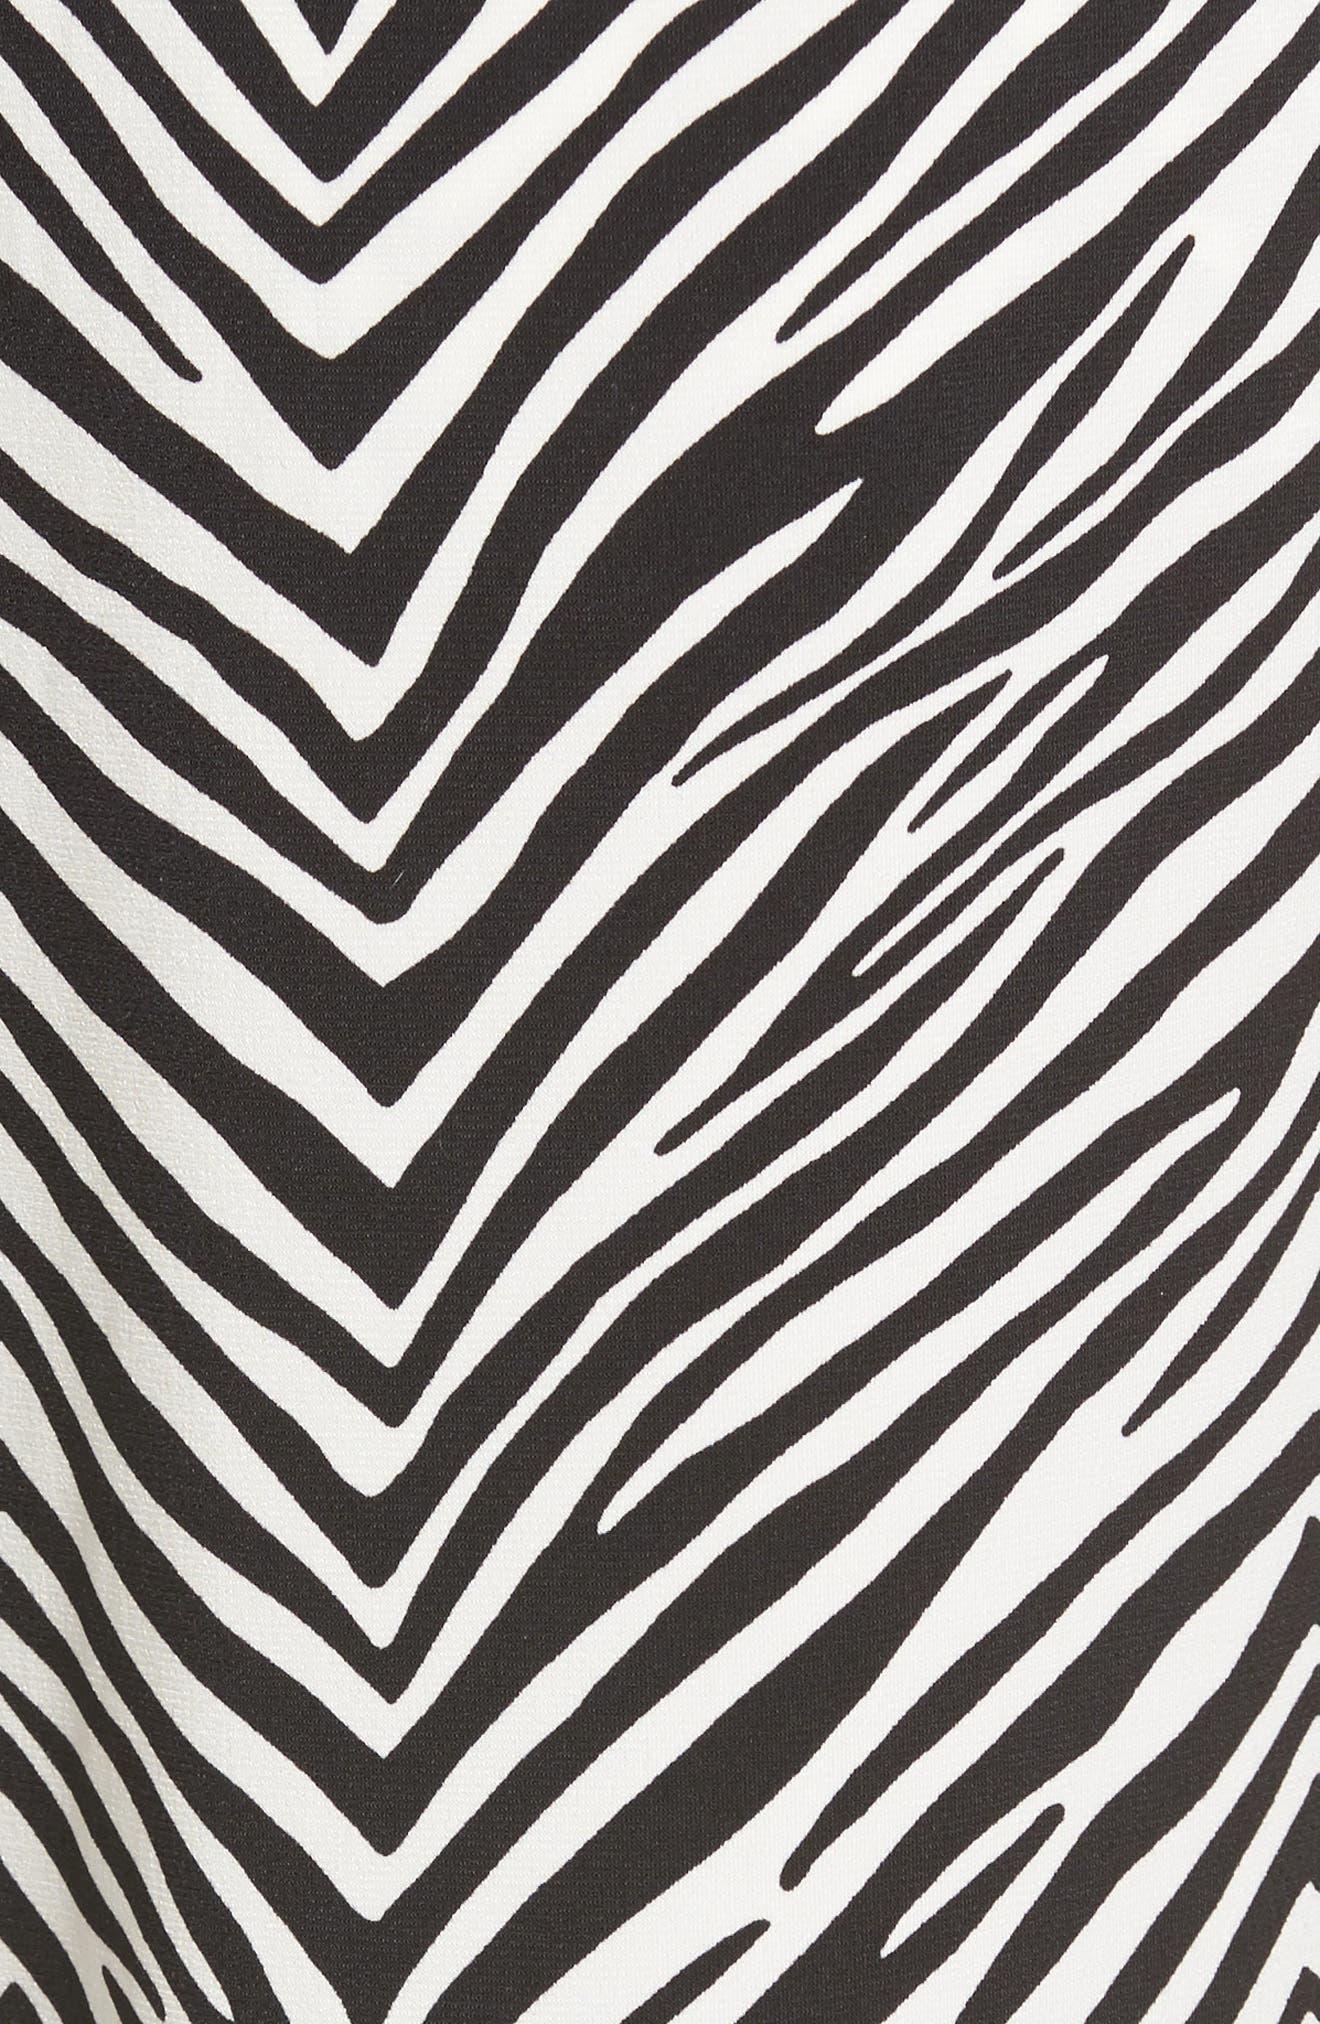 Zebra Print Drawstring Waist Pants,                             Alternate thumbnail 5, color,                             Rich Black